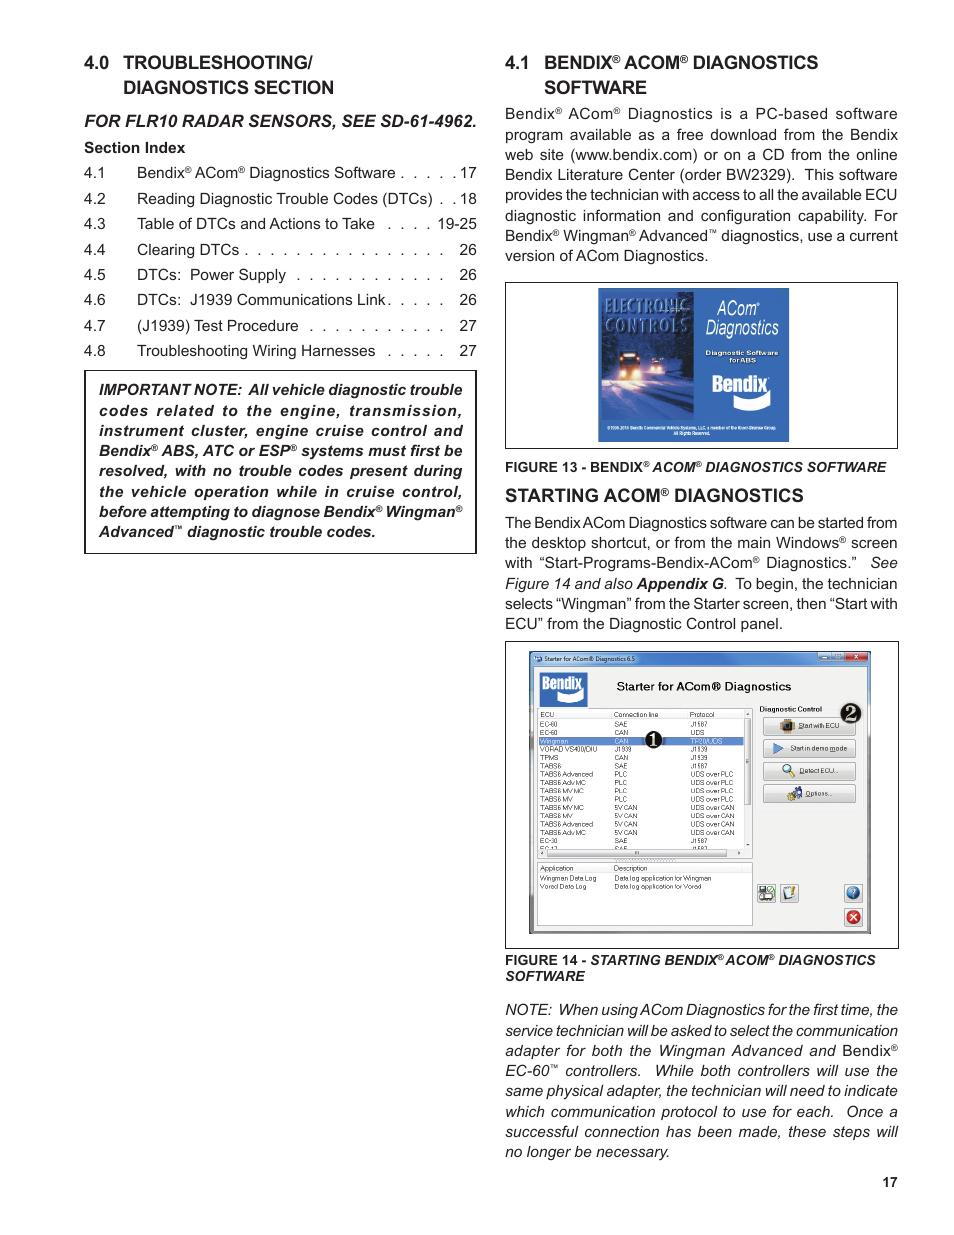 1 Bendix Acom Diagnostics Software Commercial Vehicle Wiring Harness Freeware Systems Wingman Advanced Flr20 Sensor User Manual Page 17 64